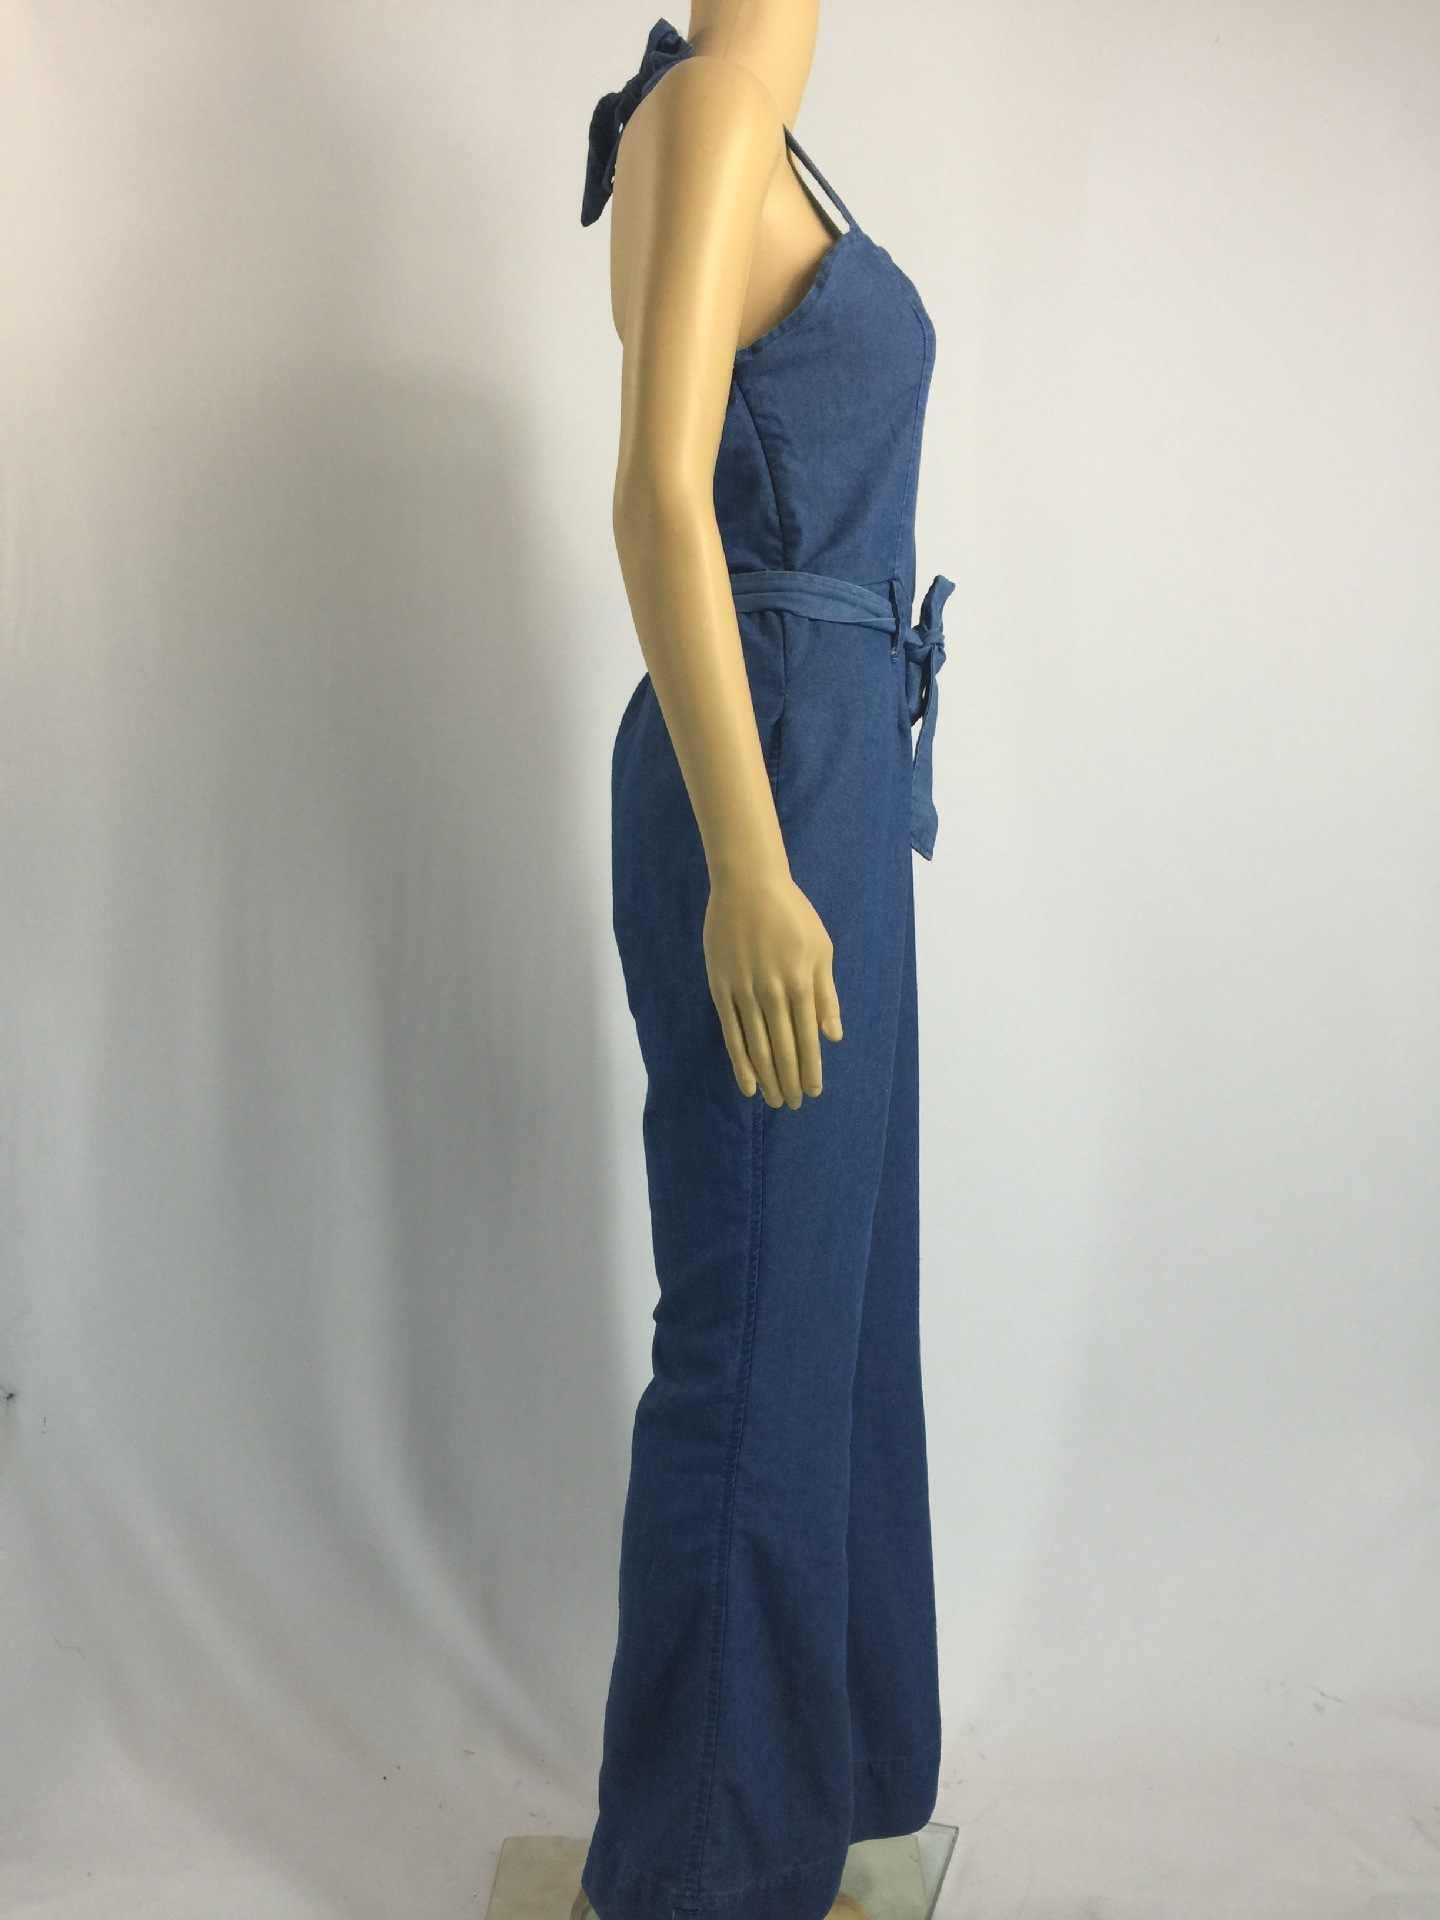 30e9b84b0e83 ... Women Ripped Denim Jumpsuits Casual Sexy Stretch Romper Plus Size XL  Ladies Denim Pencil Overalls